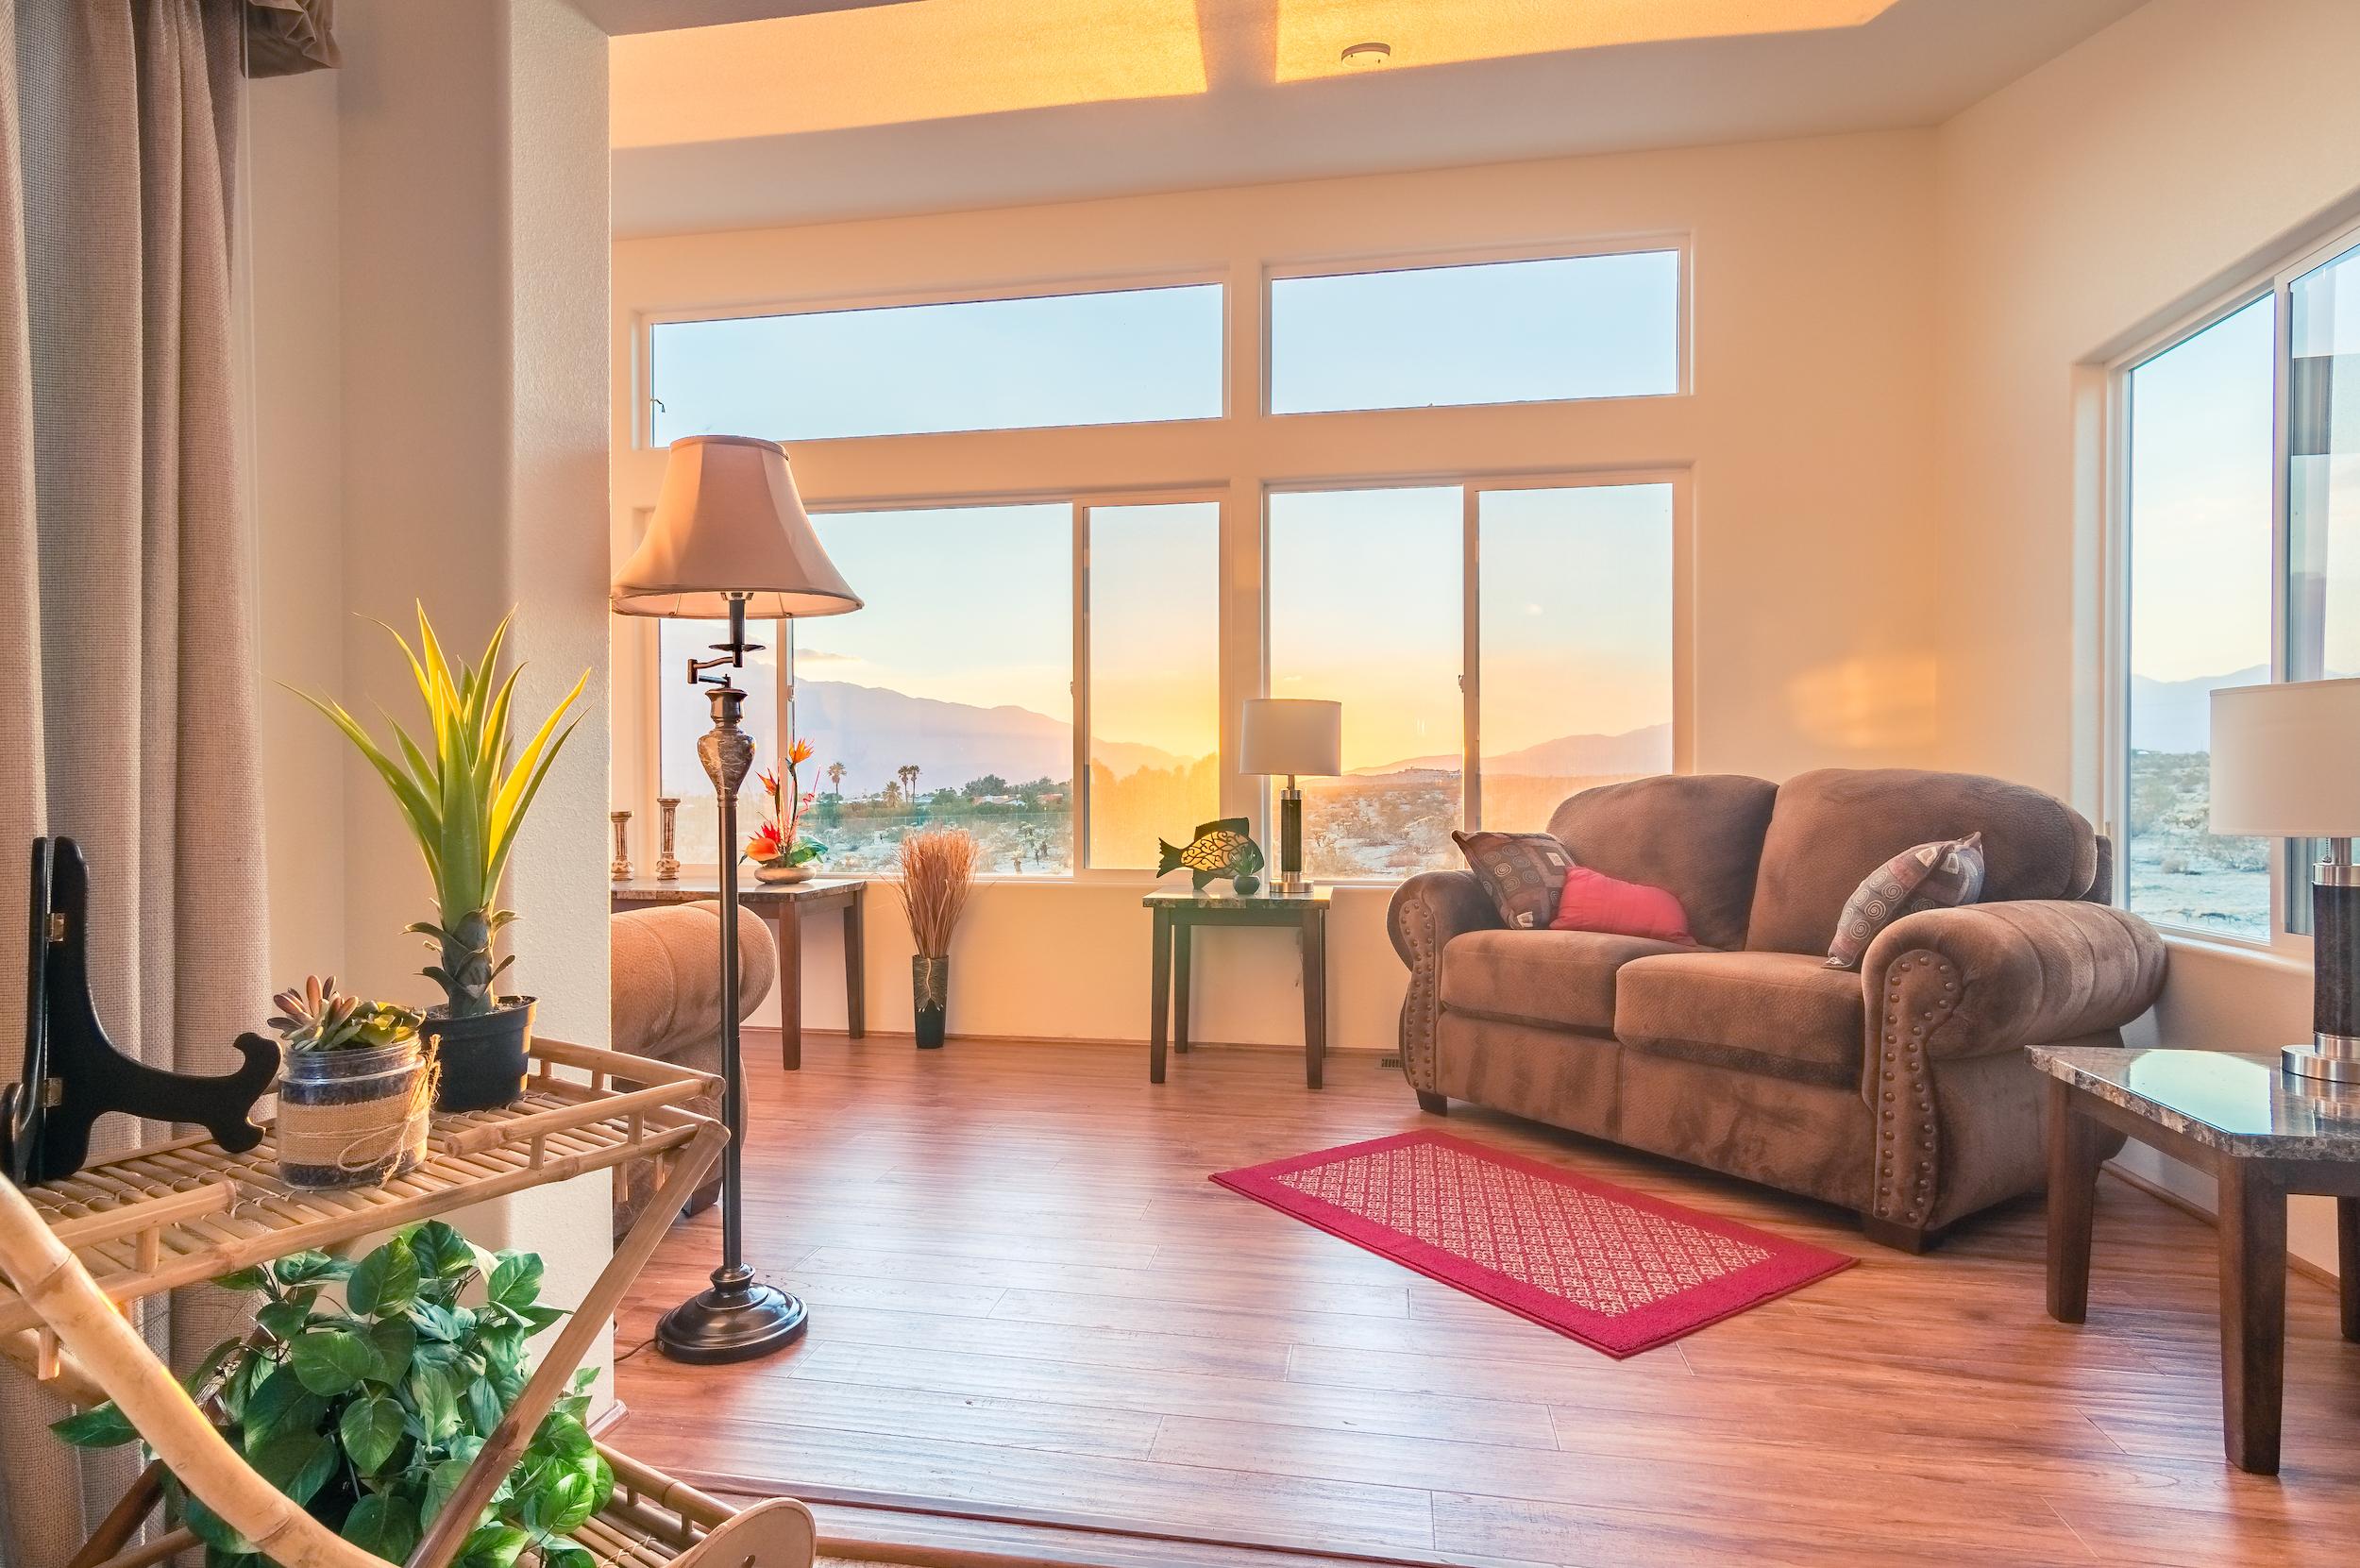 spacious-interior-large-windows-sunset.jpg